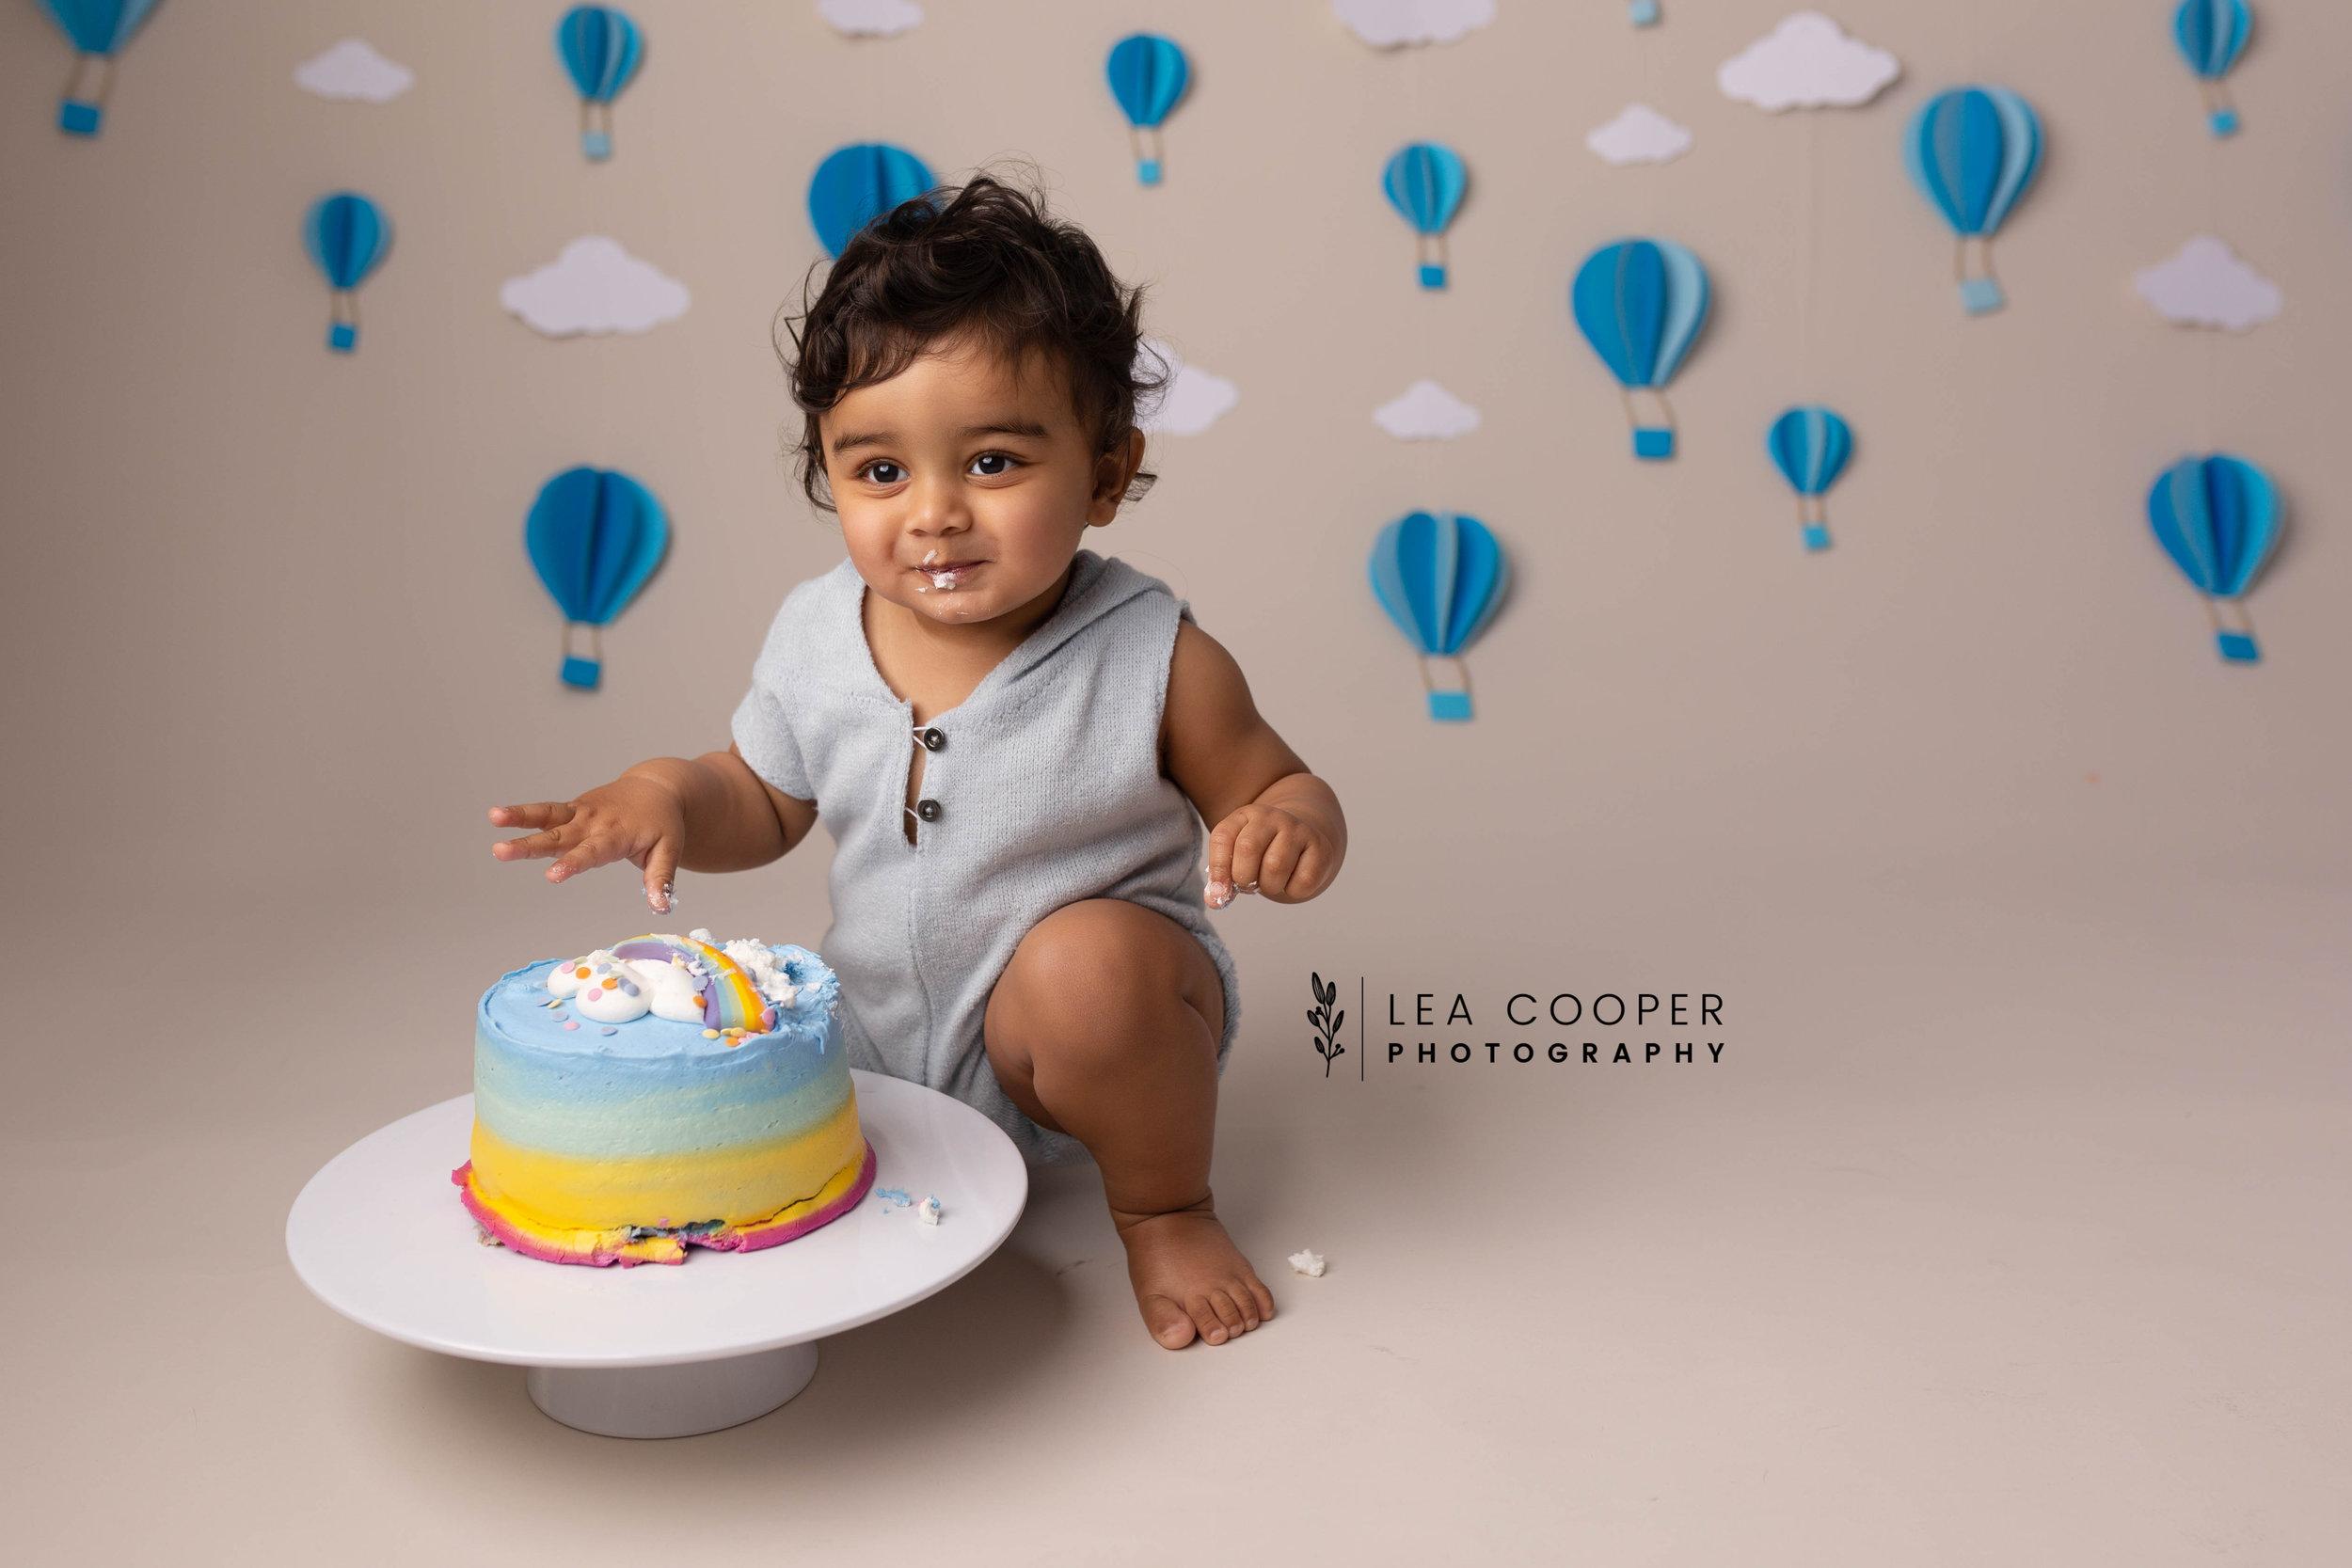 LEA-COOPER-PHOTOGRAPHY-CAKE-SMASH-PHOTOGRAPHER-WILLENALL-WOLVERHAMPTON-CHILD-PHOTOSHOOT-1ST—BIRTHDAY-PICTURES-WEDNESBURY-WALSALL-DUDLEY-WEST-MIDLANDS-UK-16.JPG